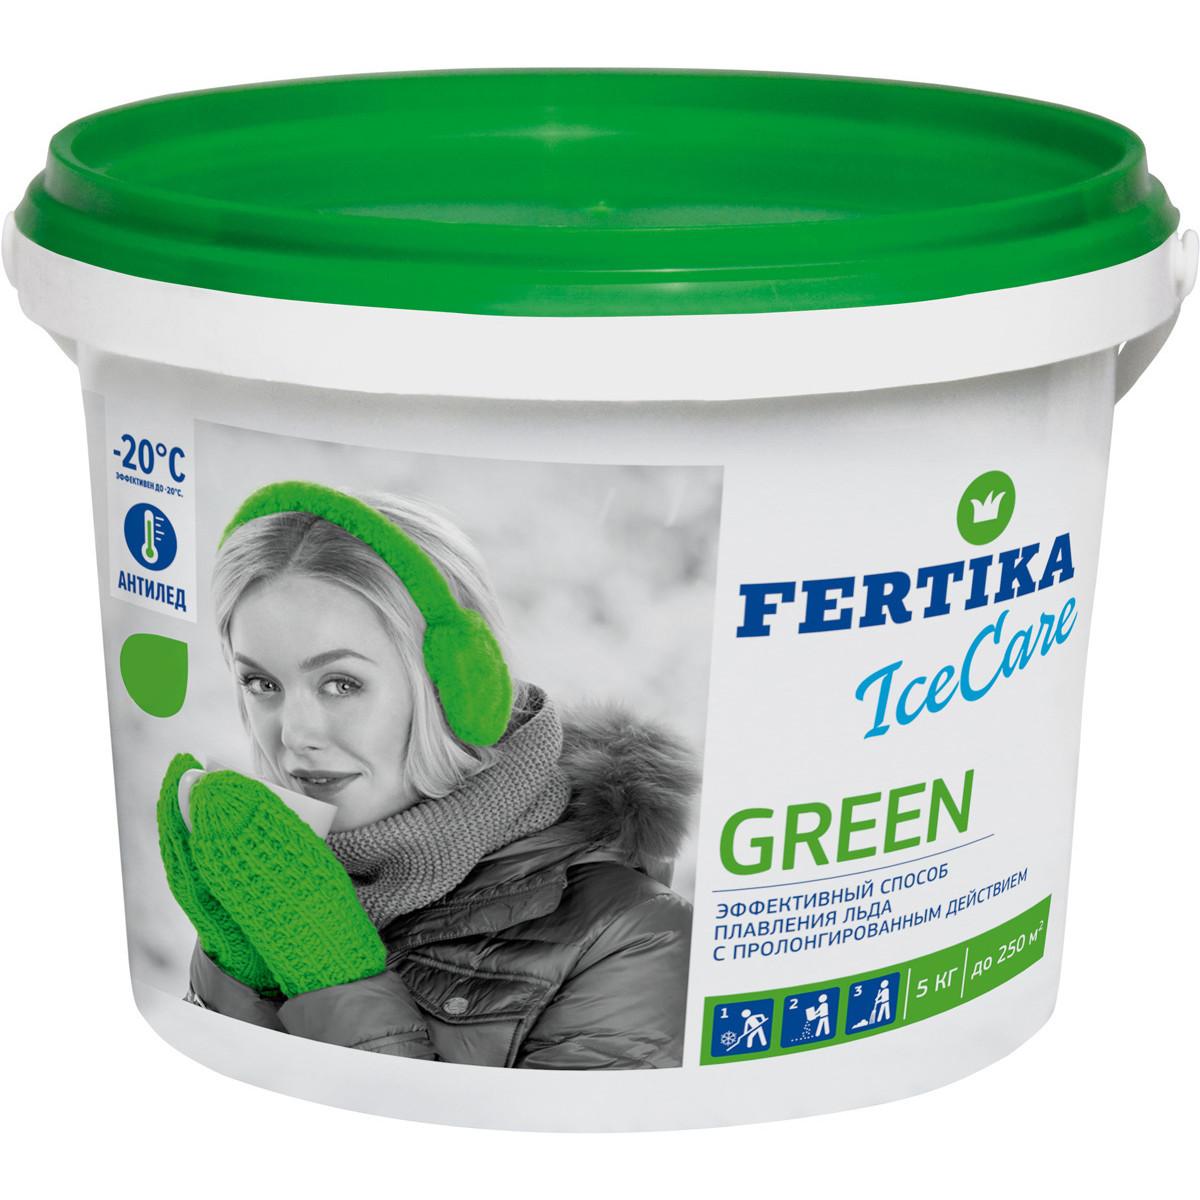 Противогололедное средство Фертика Ice Care Green 5 кг